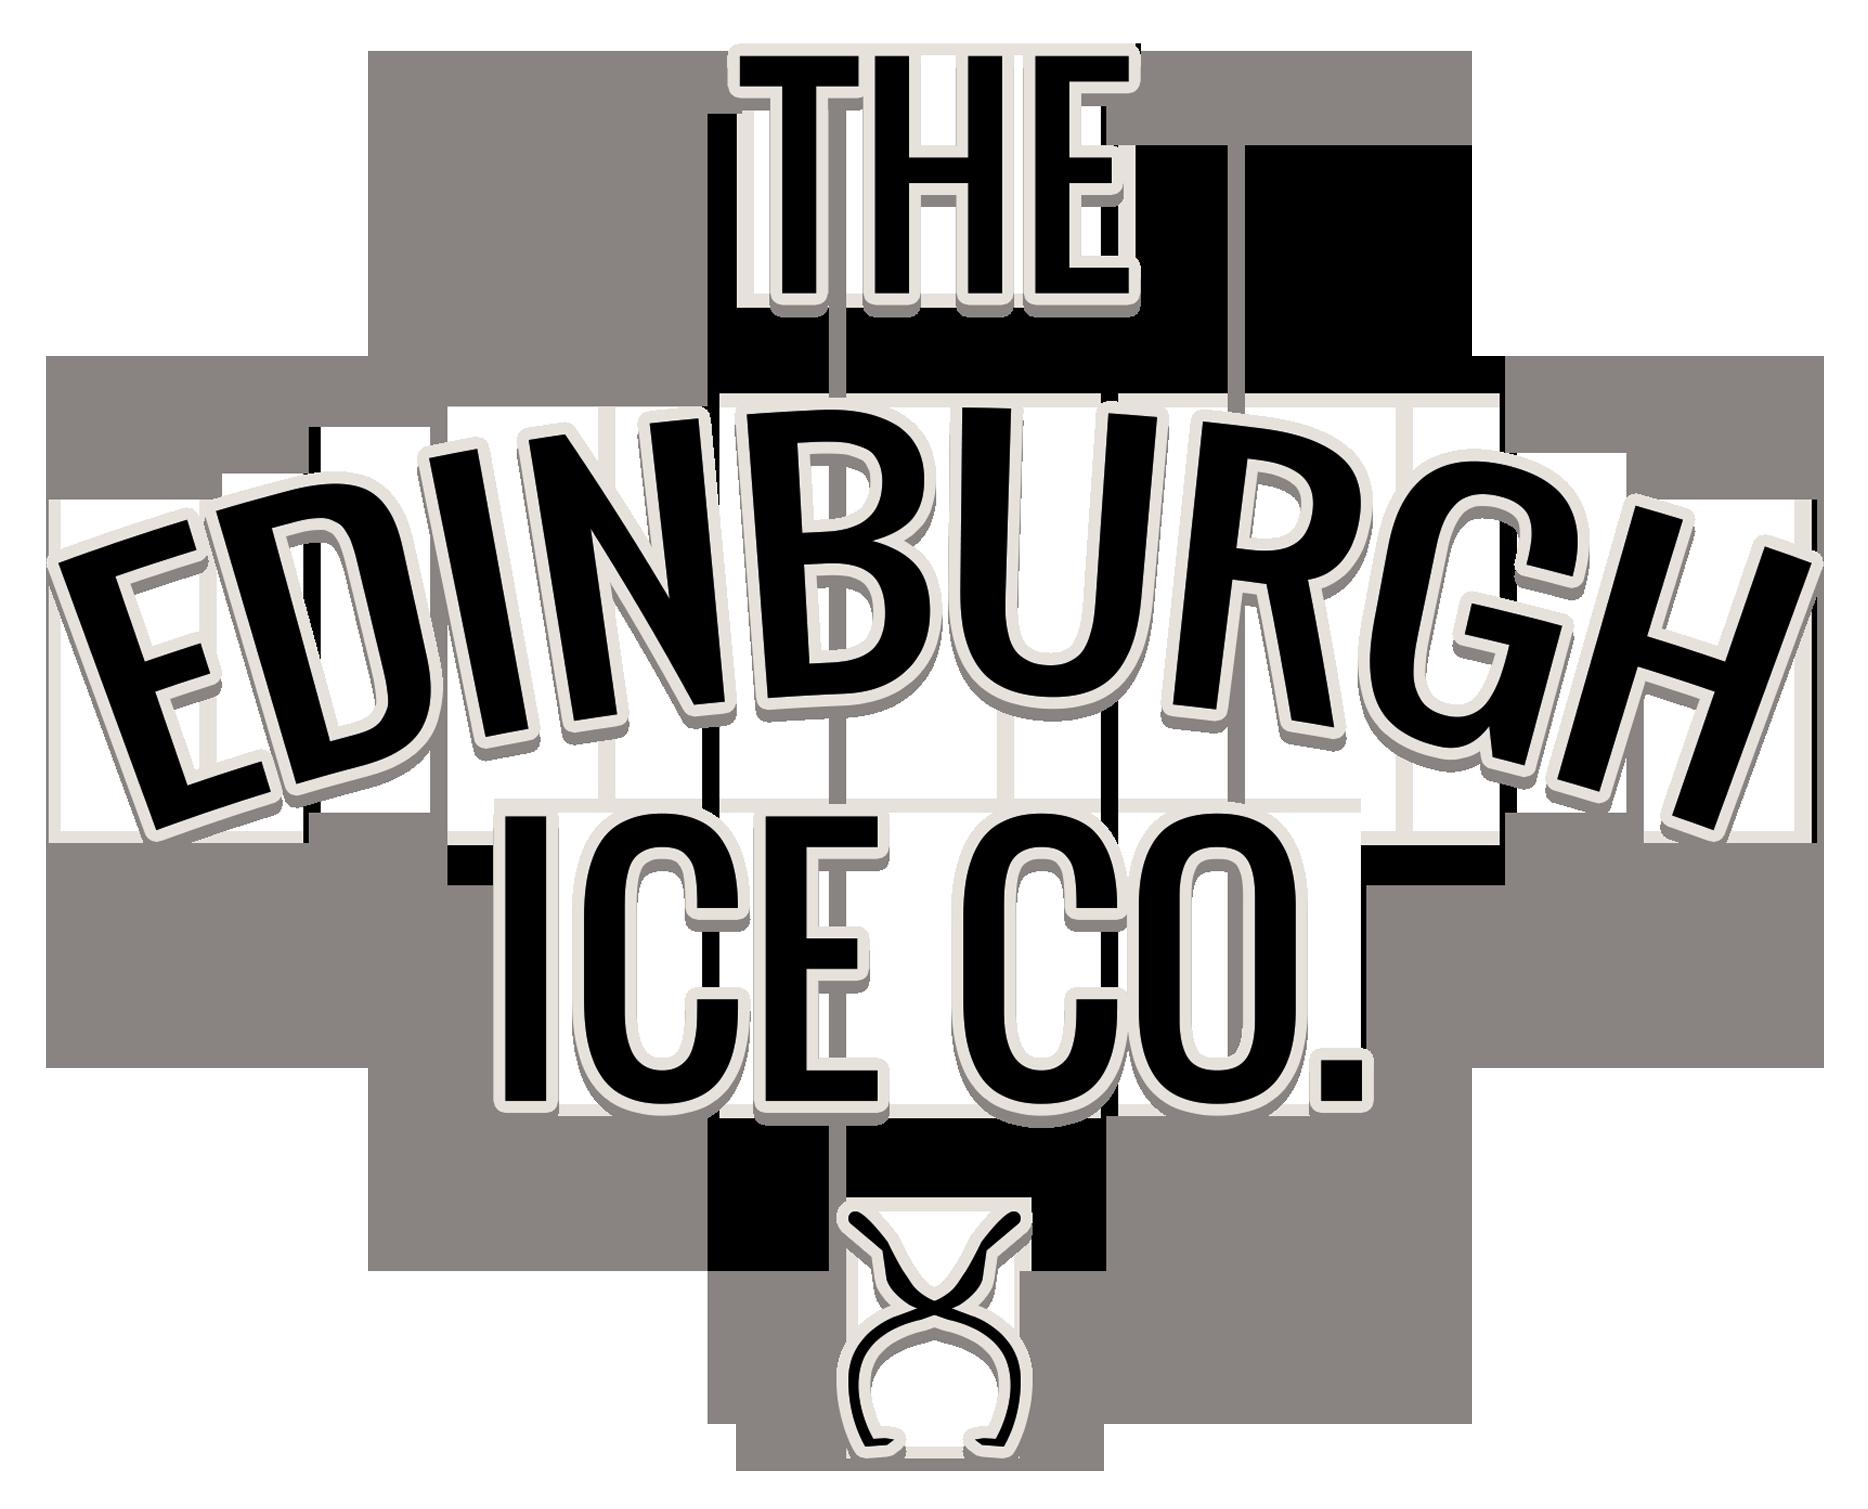 The Edinburgh Ice Co. logo designed by Dephined